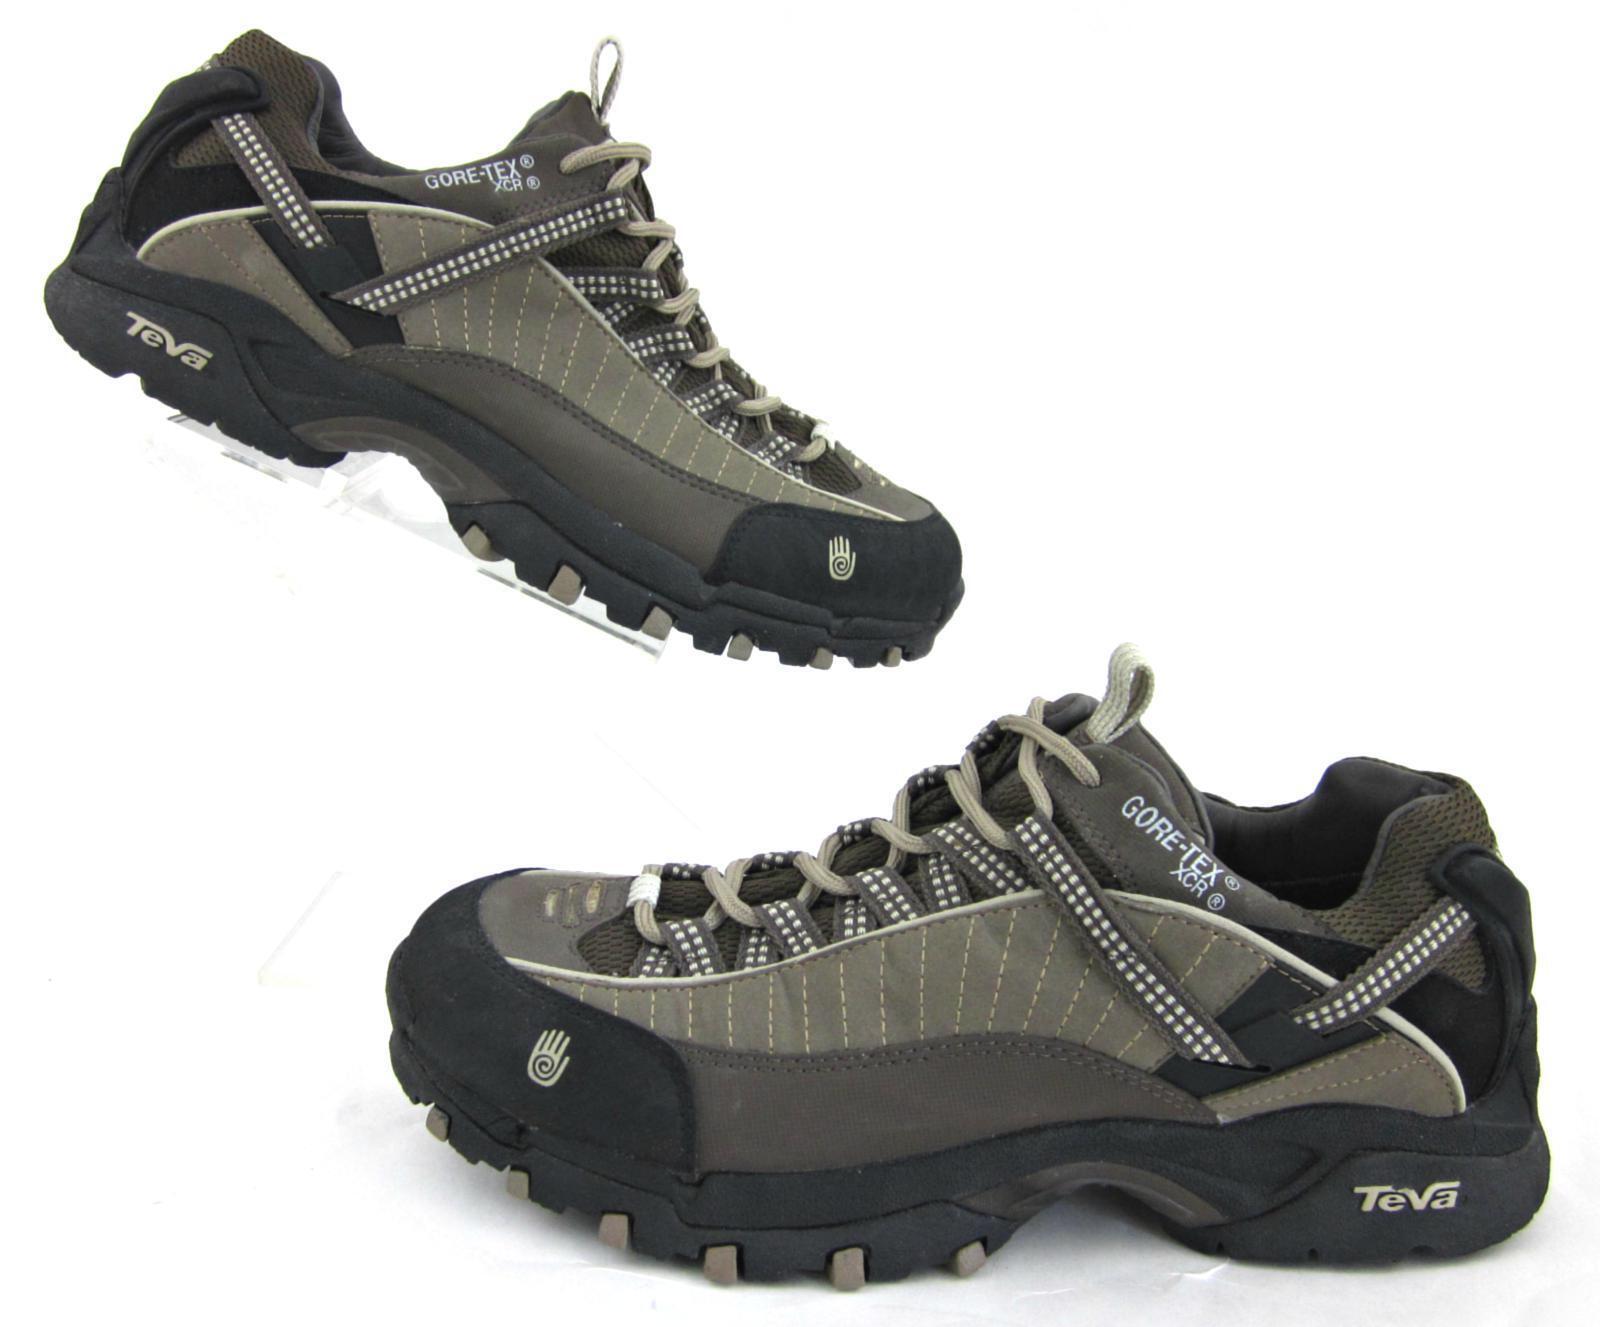 NEW  Teva XCR GORE-TEX Waterproof Hiking Trail shoes Brown Sz 8